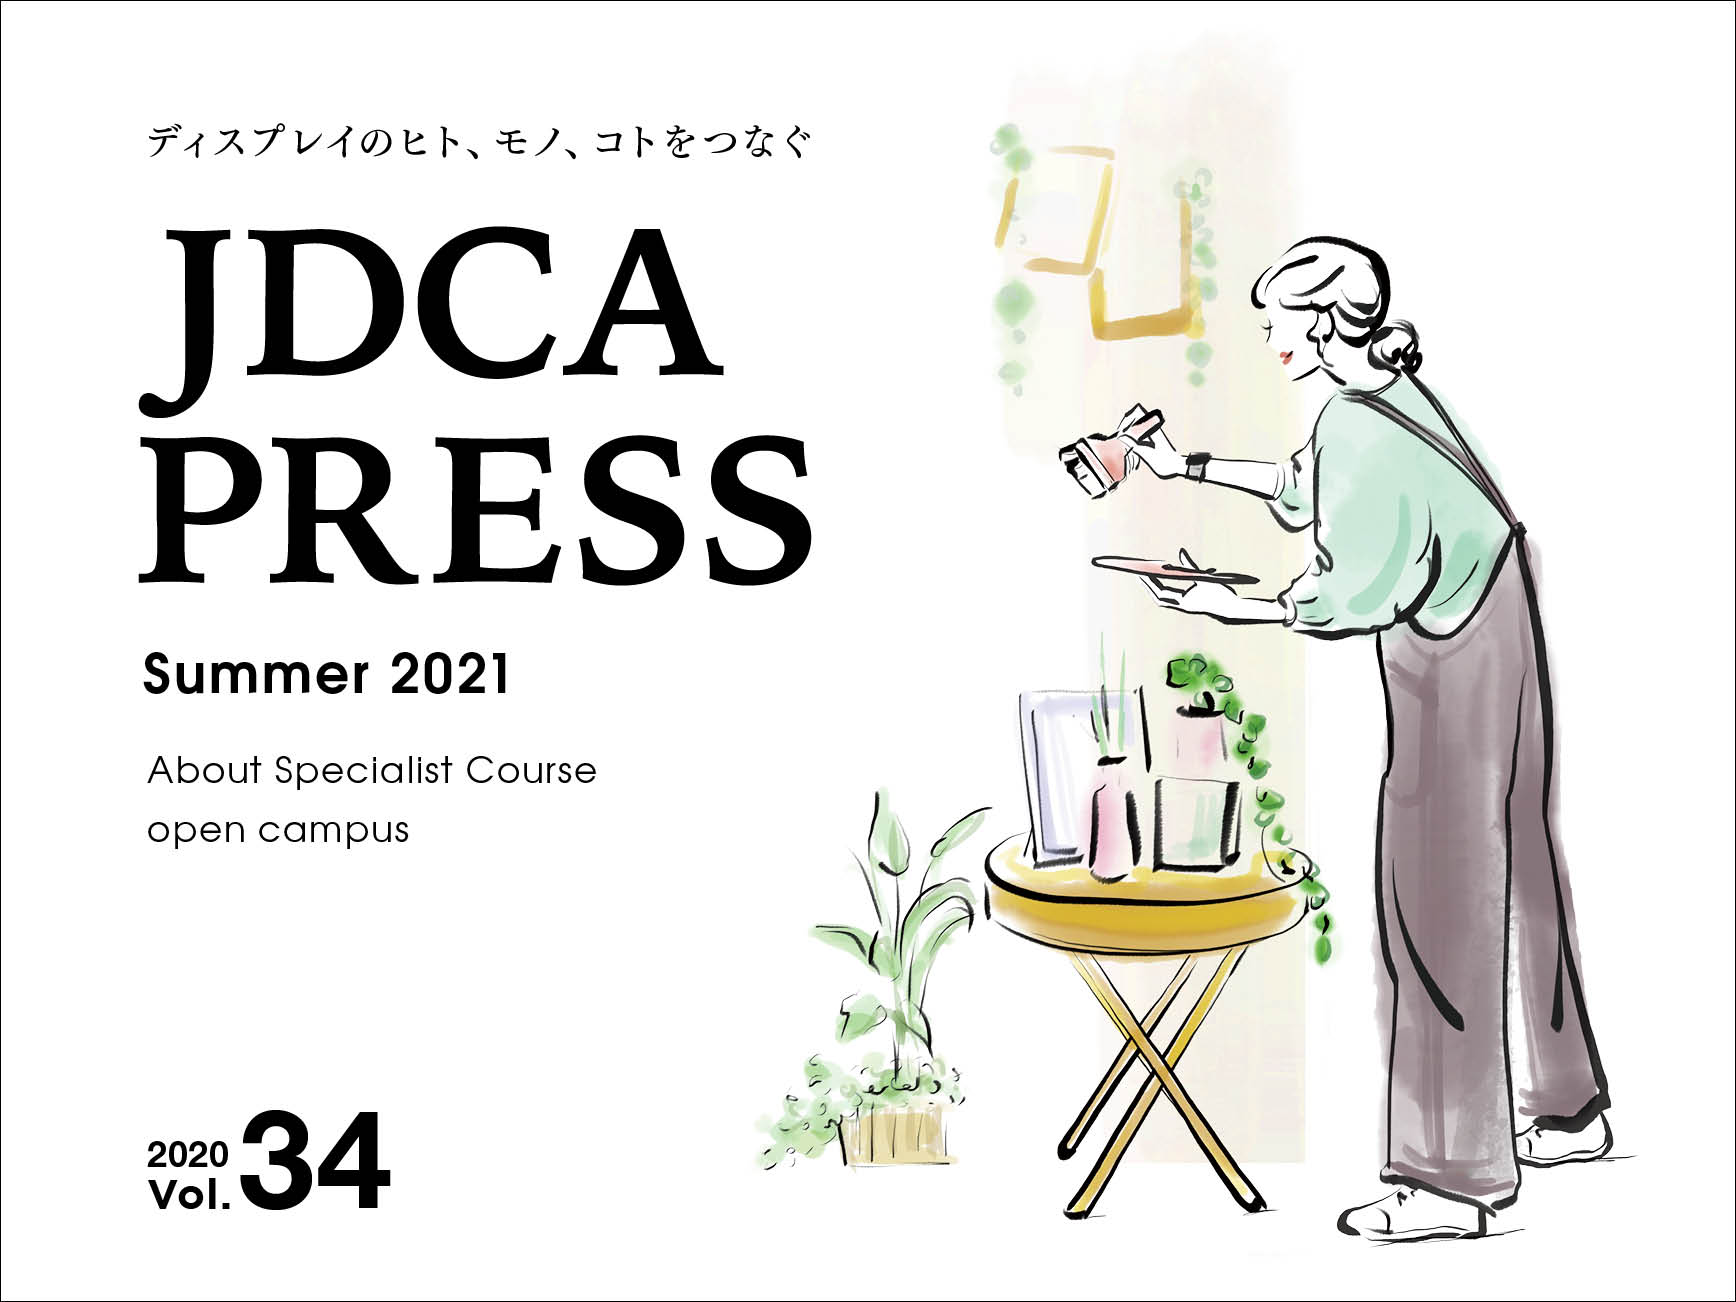 JDCA PRESS最新号